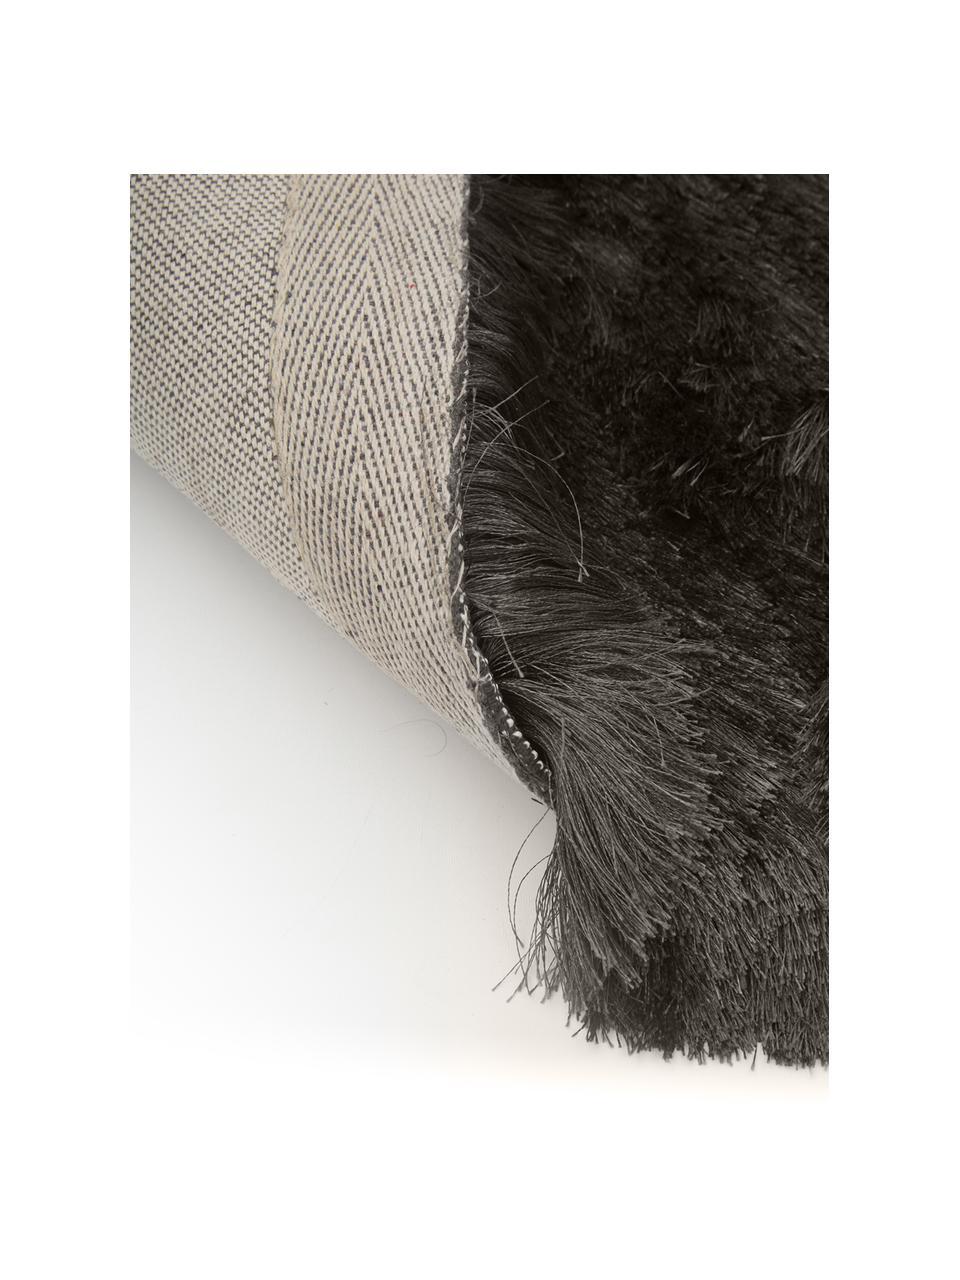 Glänzender Hochflor-Teppich Jimmy in Dunkelgrau, Flor: 100% Polyester, Dunkelgrau, B 300 x L 400 cm (Größe XL)